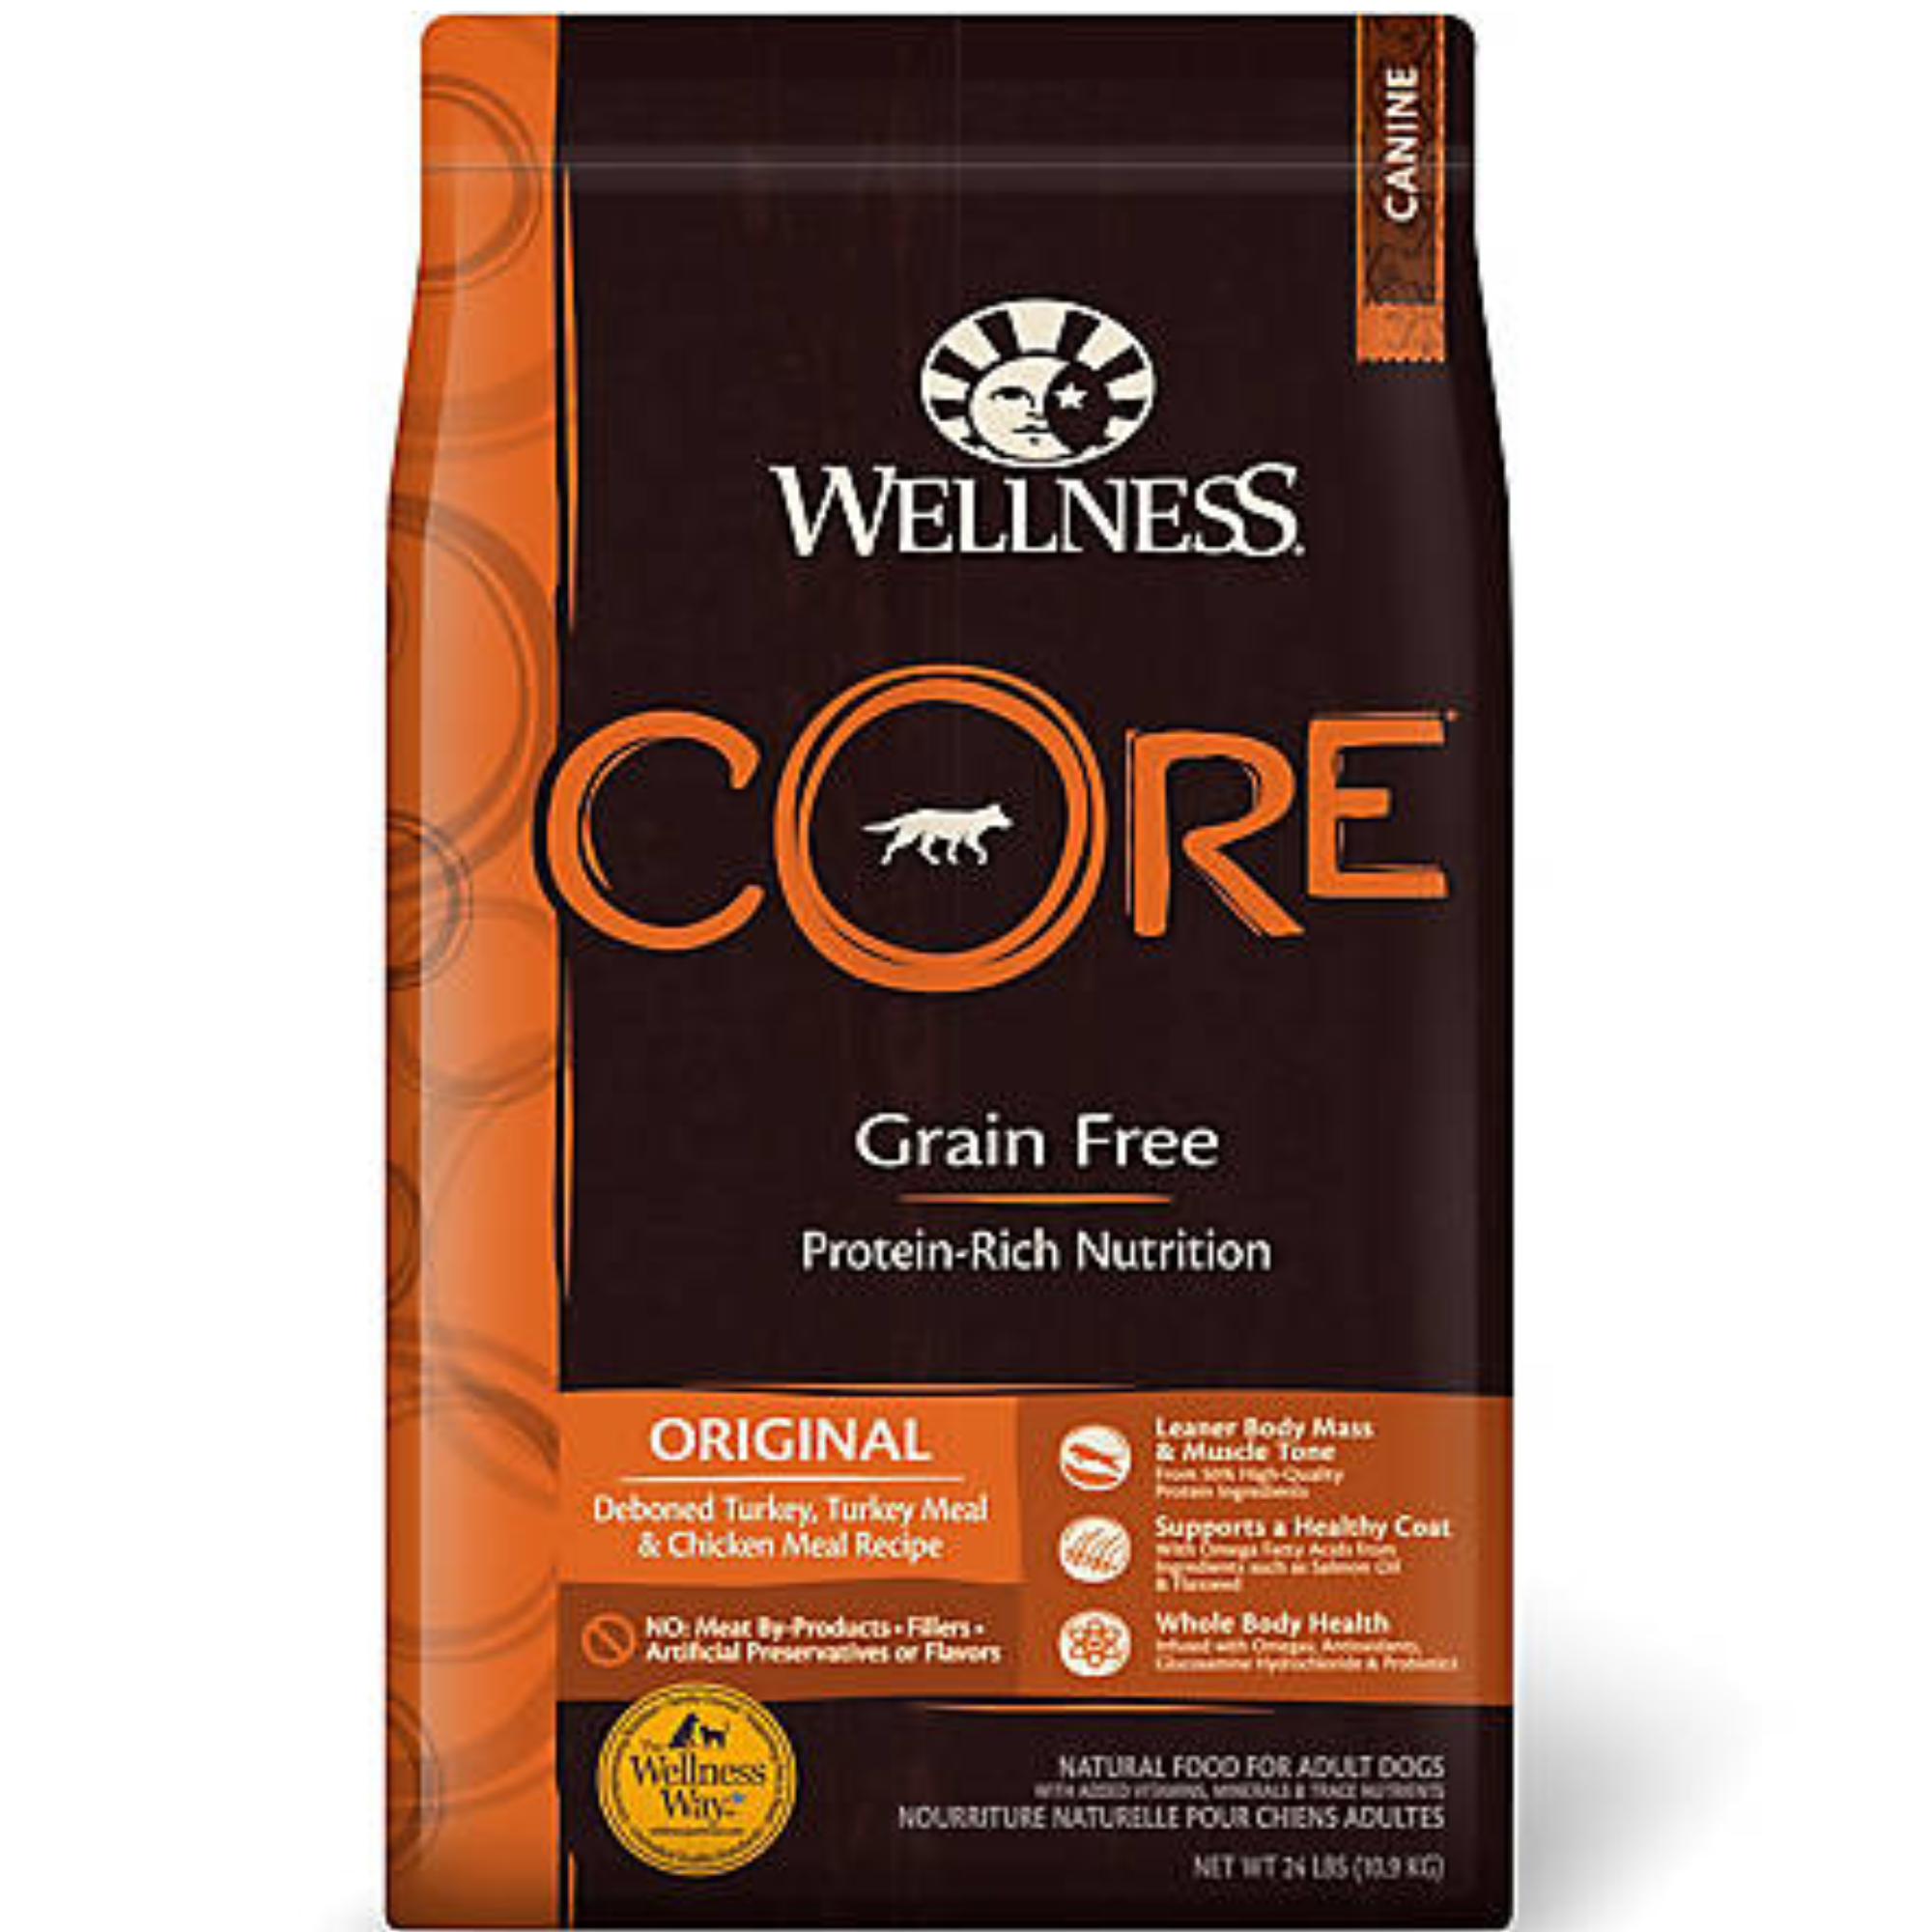 Wellness Core Original GF Dog Food